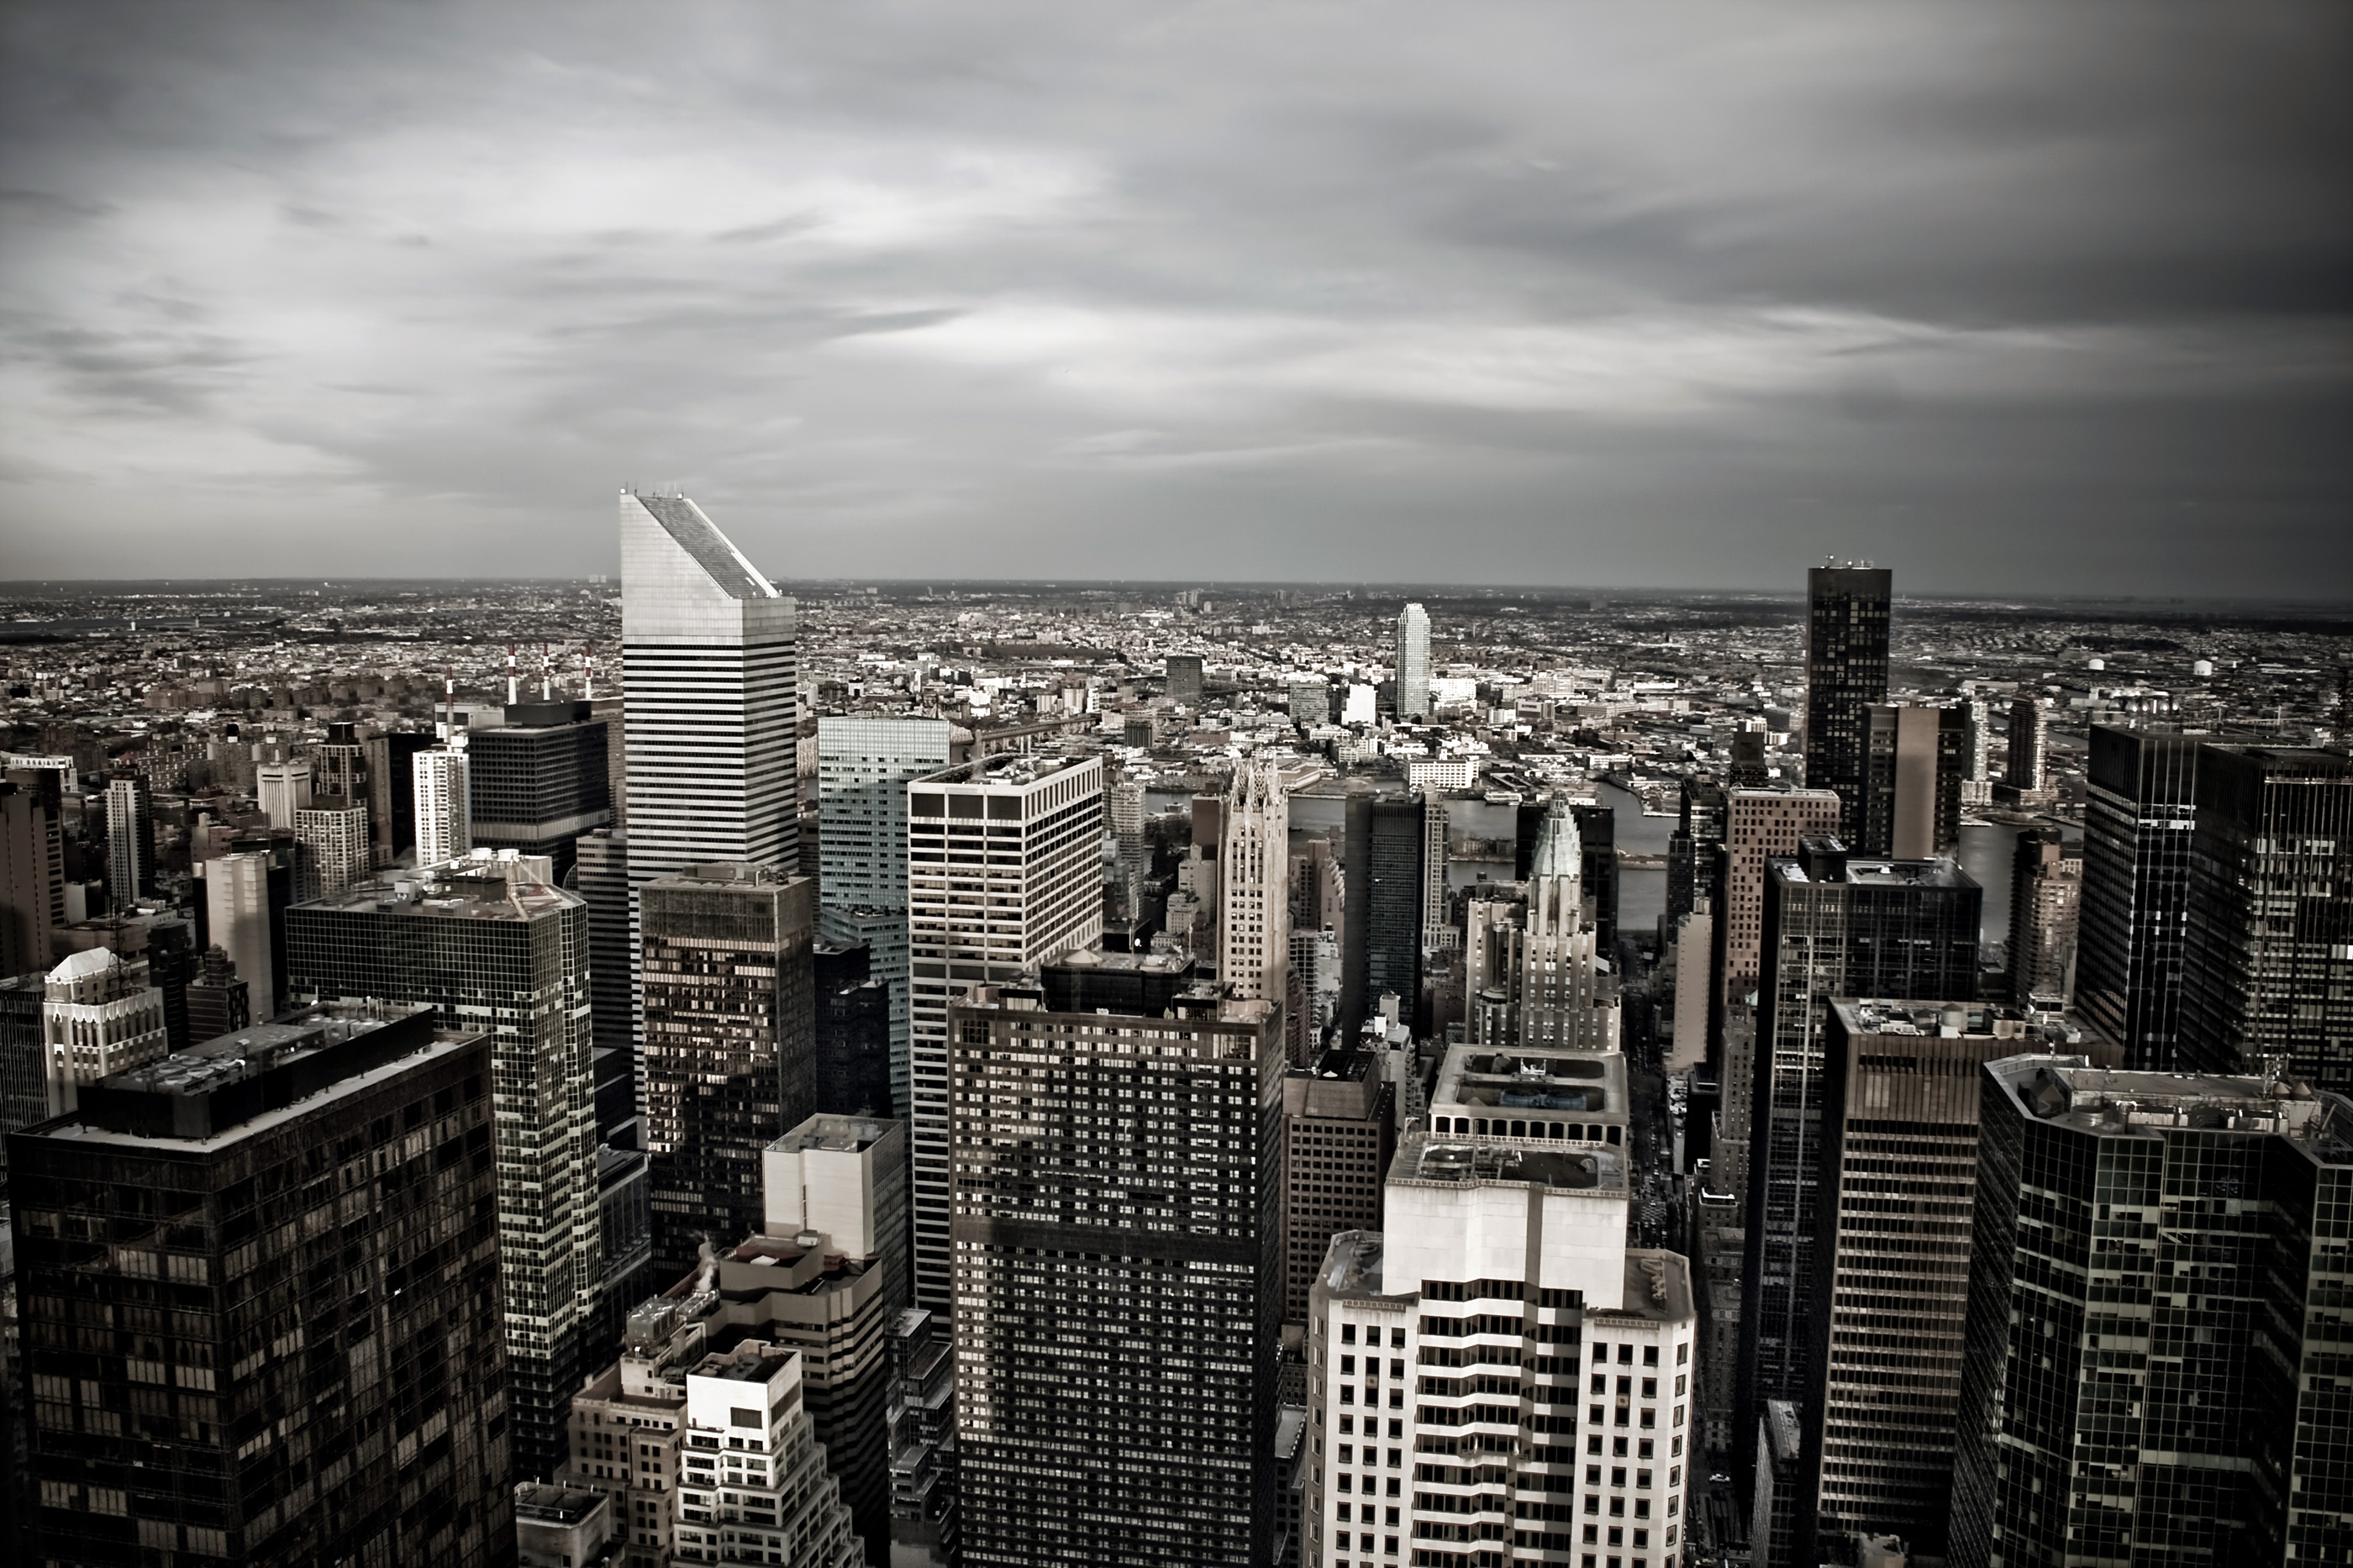 Investissement investissement L'immobilier, le pire investissement ? investissement